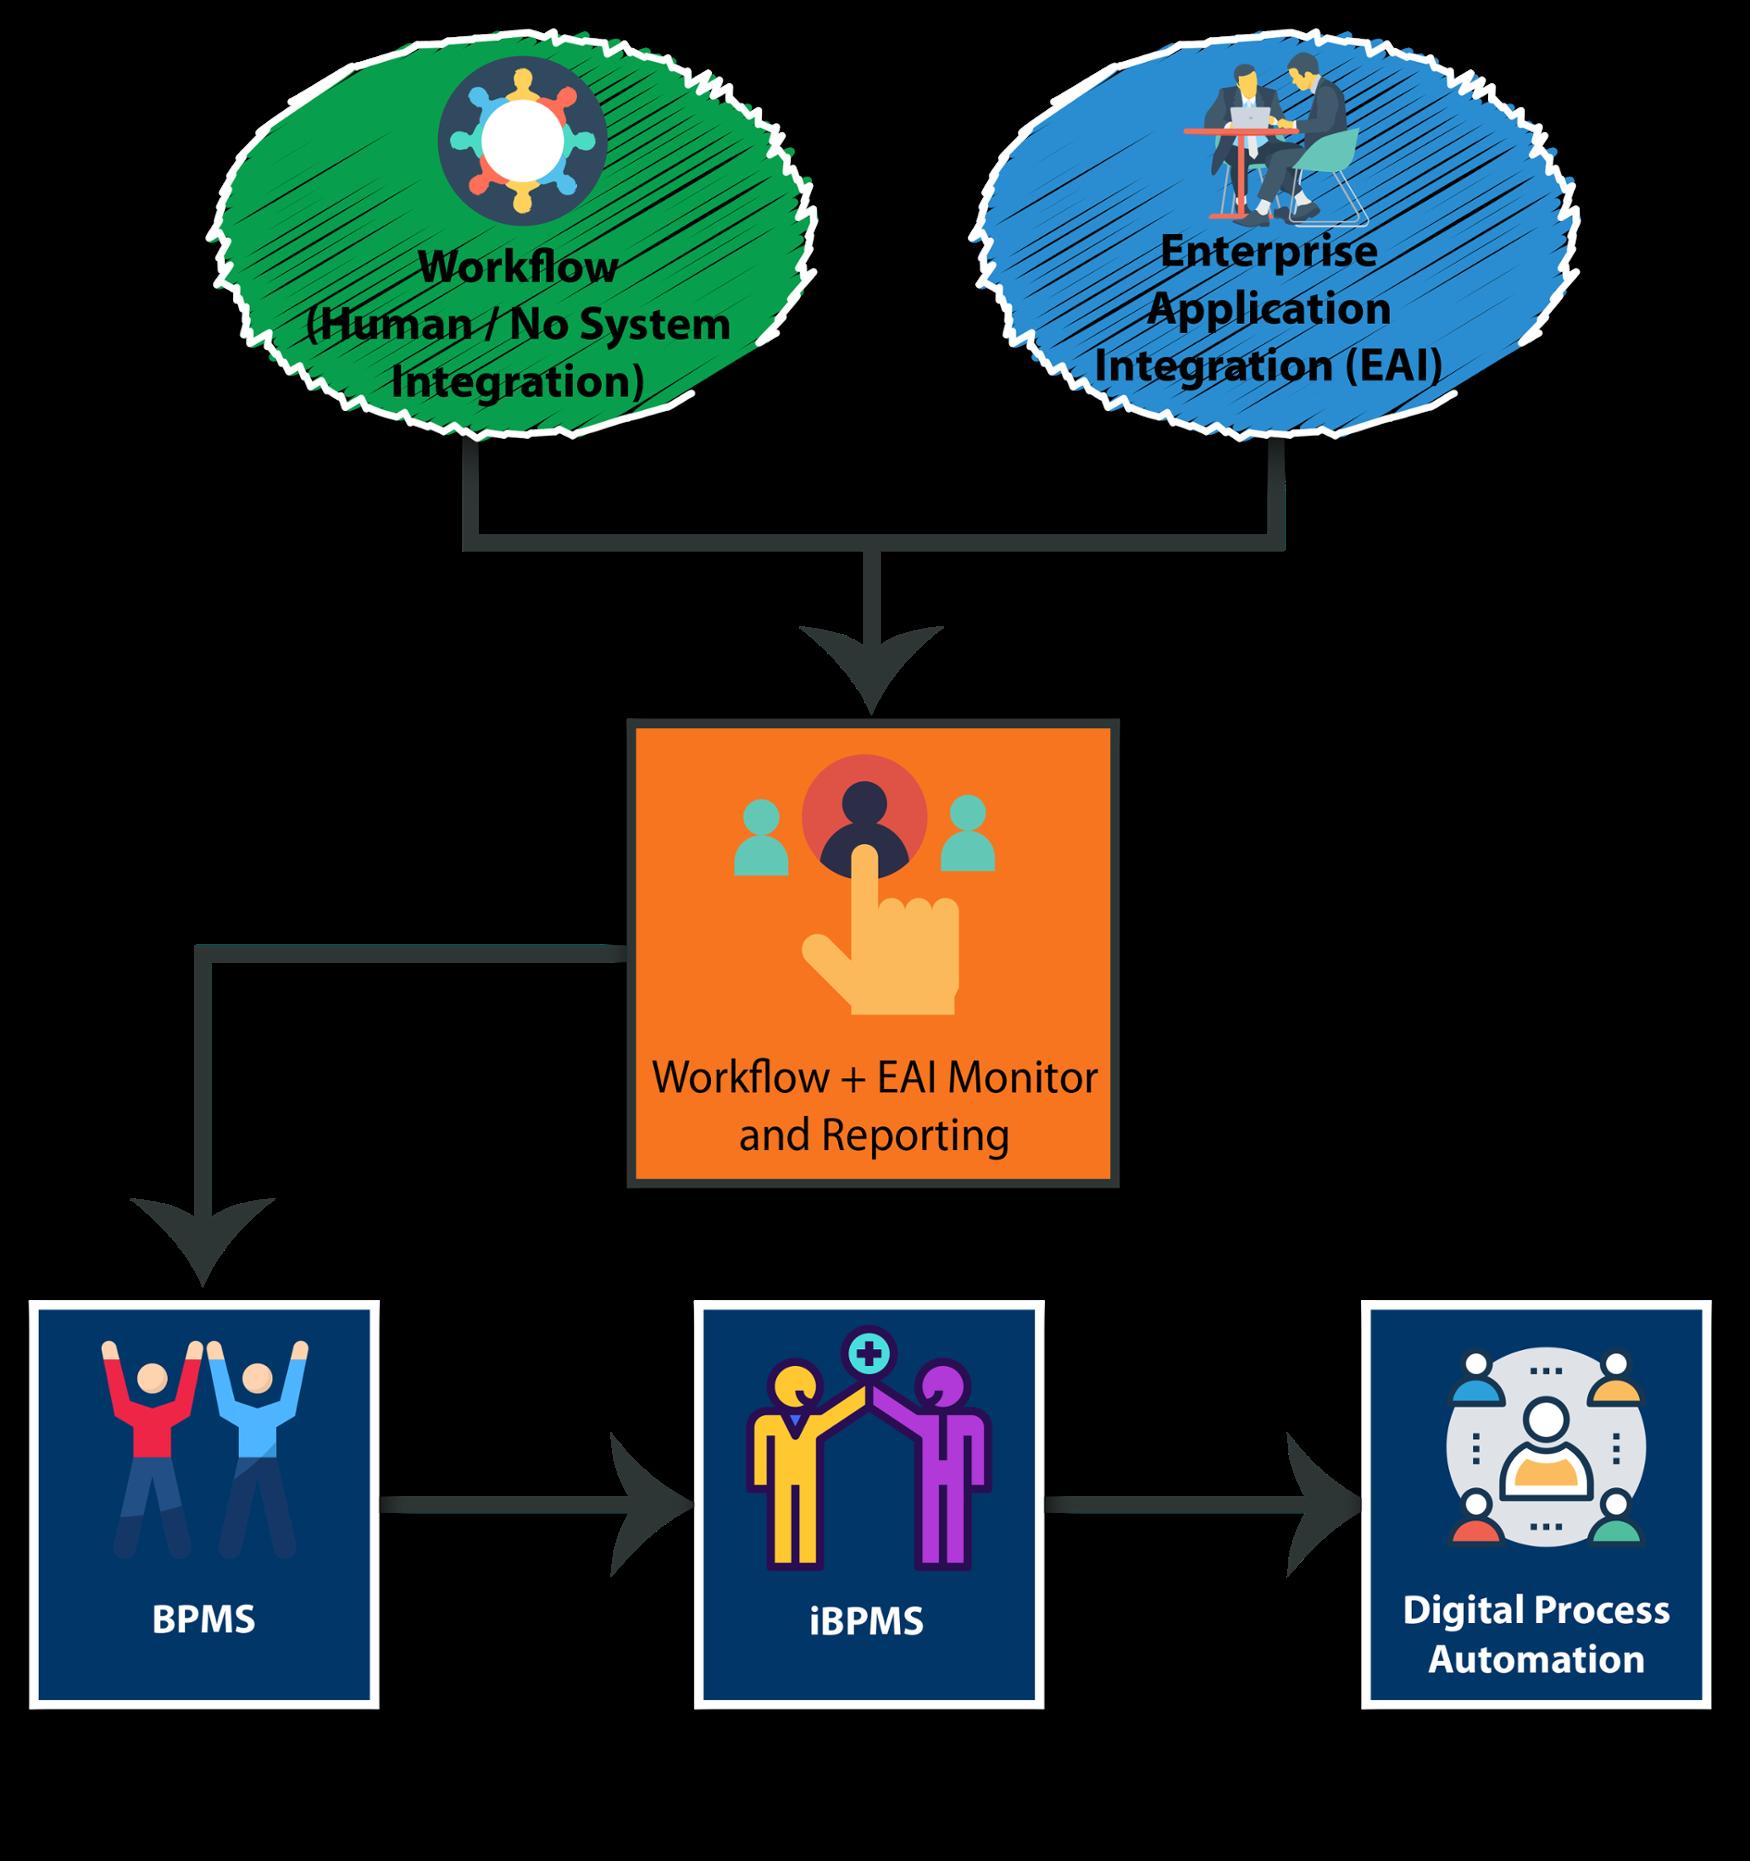 Digital Process Automation